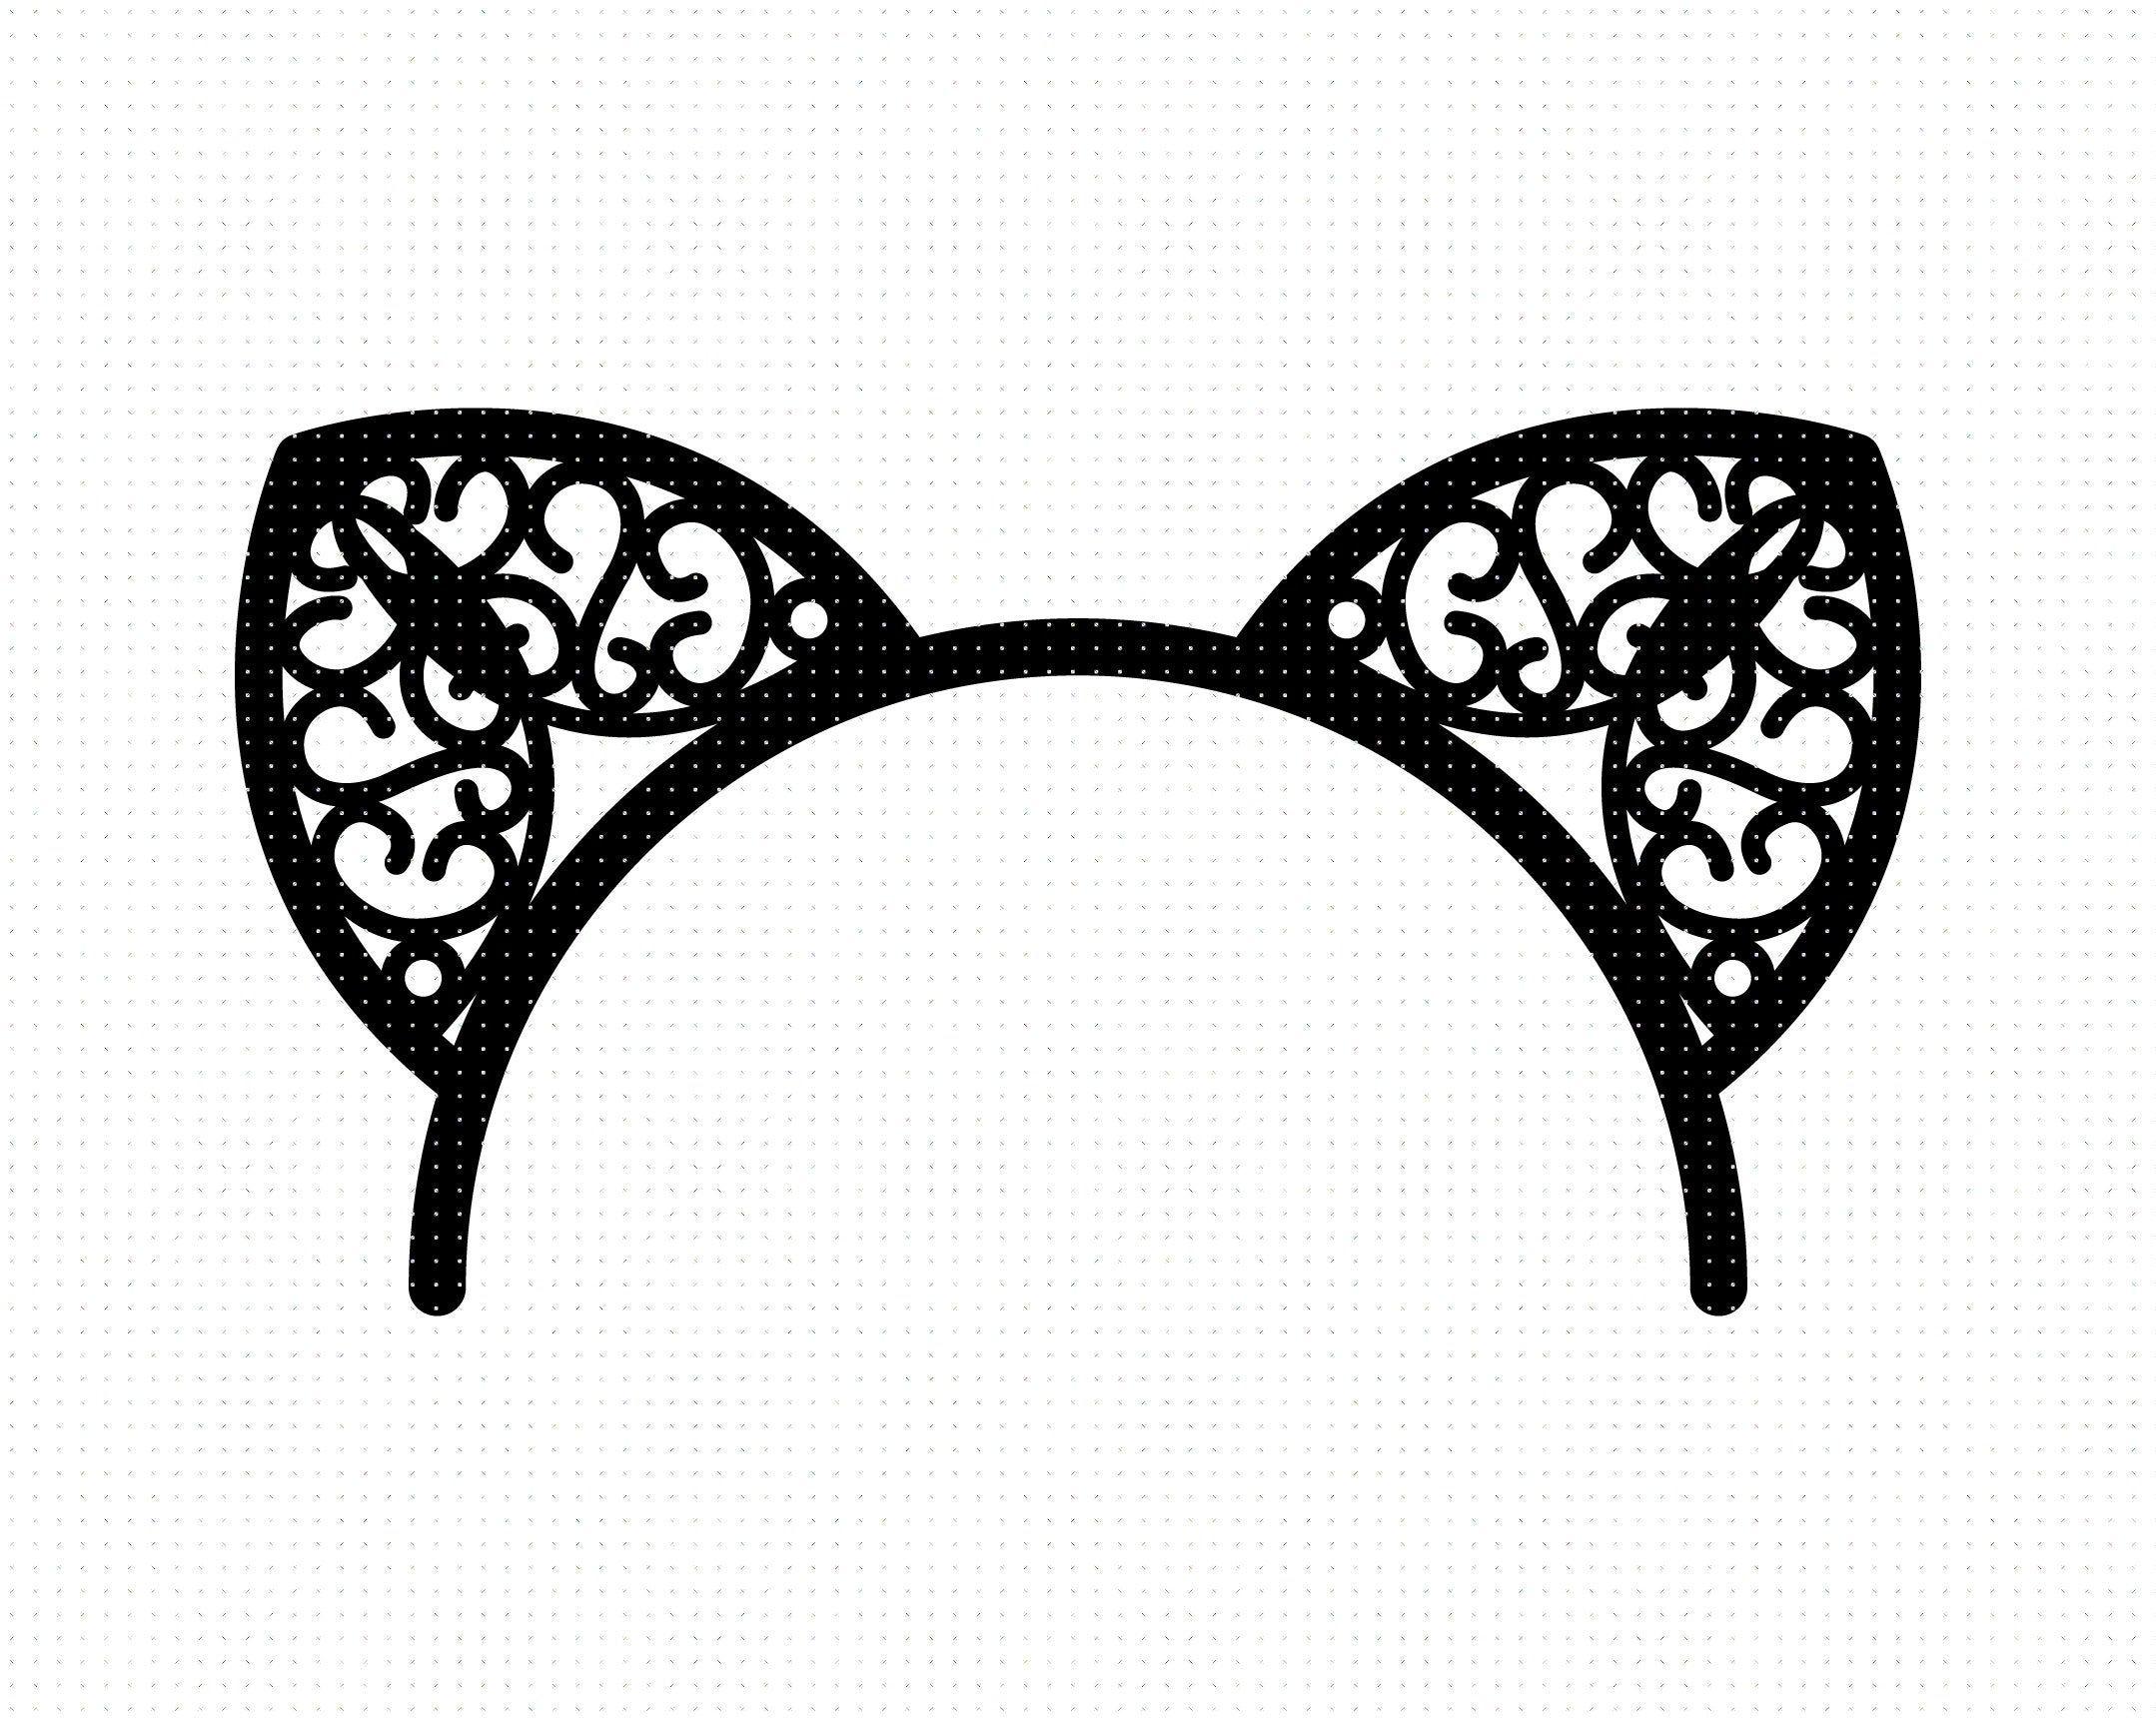 Cat Ears Headband Svg Cat Ears Svg Headband Svg Cat Ears Etsy Cat Ears Headband Ear Headbands Hand Silhouette